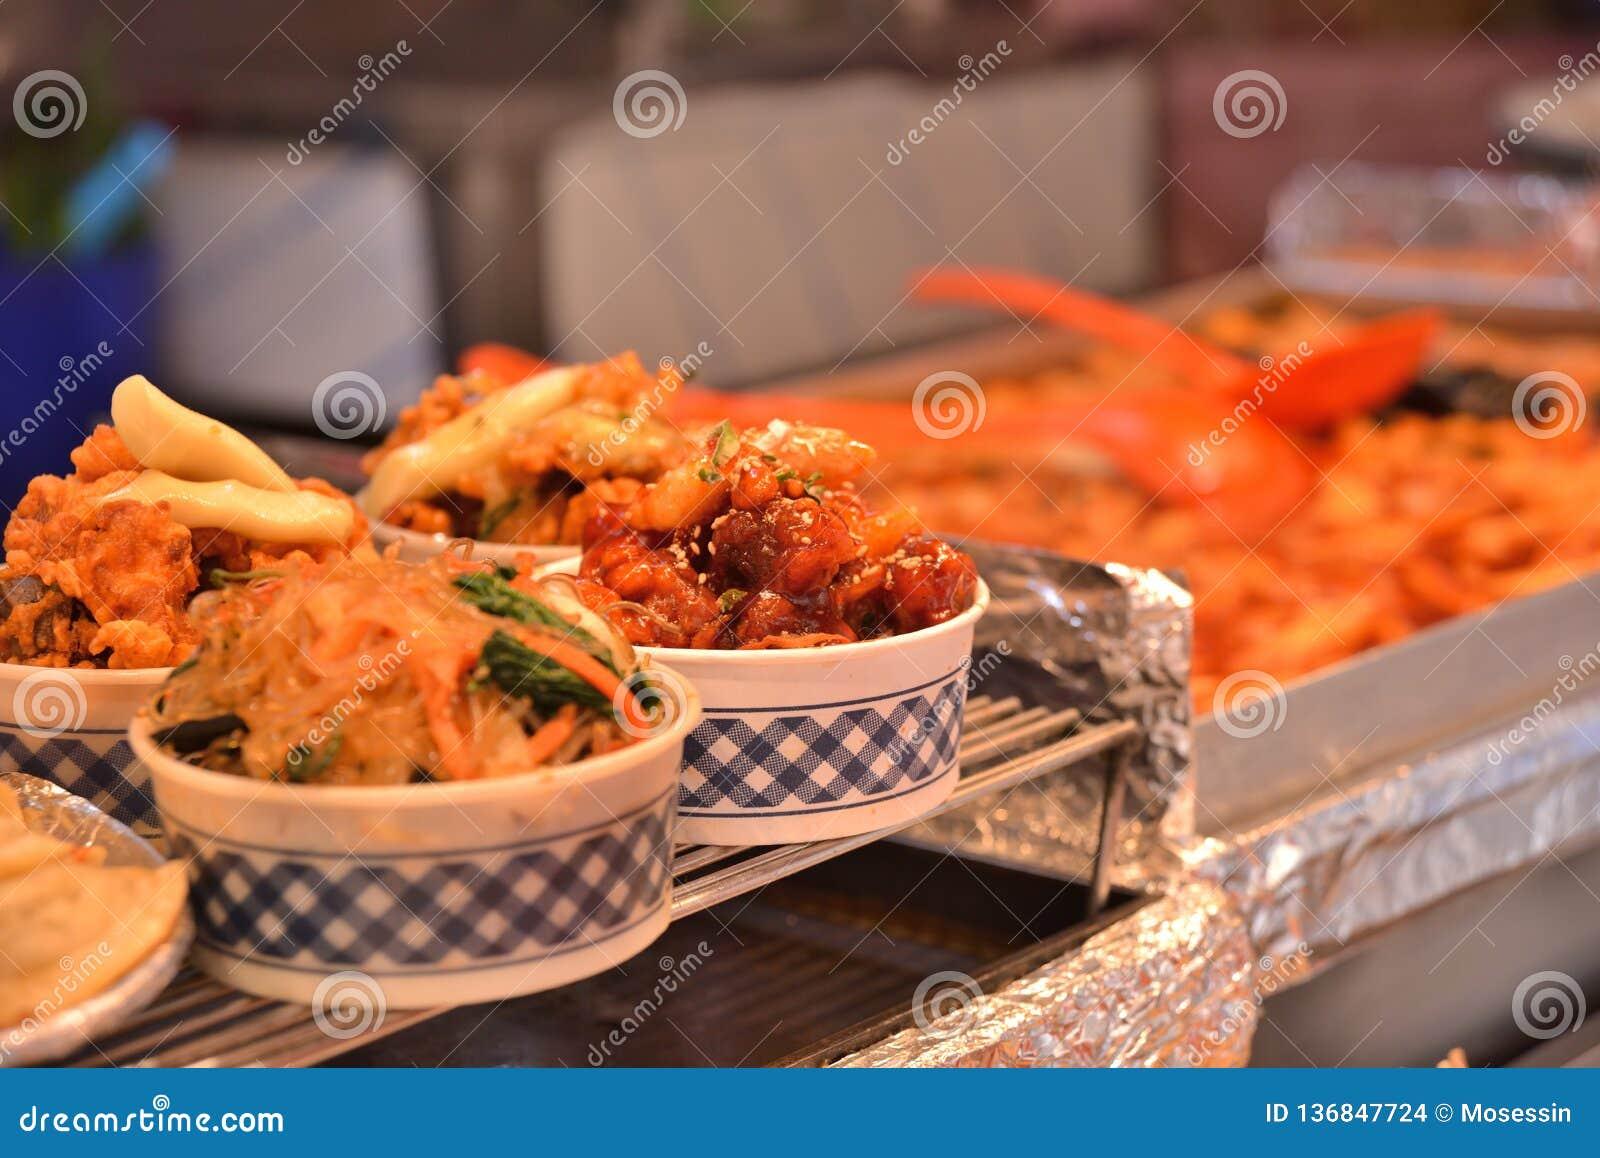 Varma mellanmål för koreansk stil i bunke